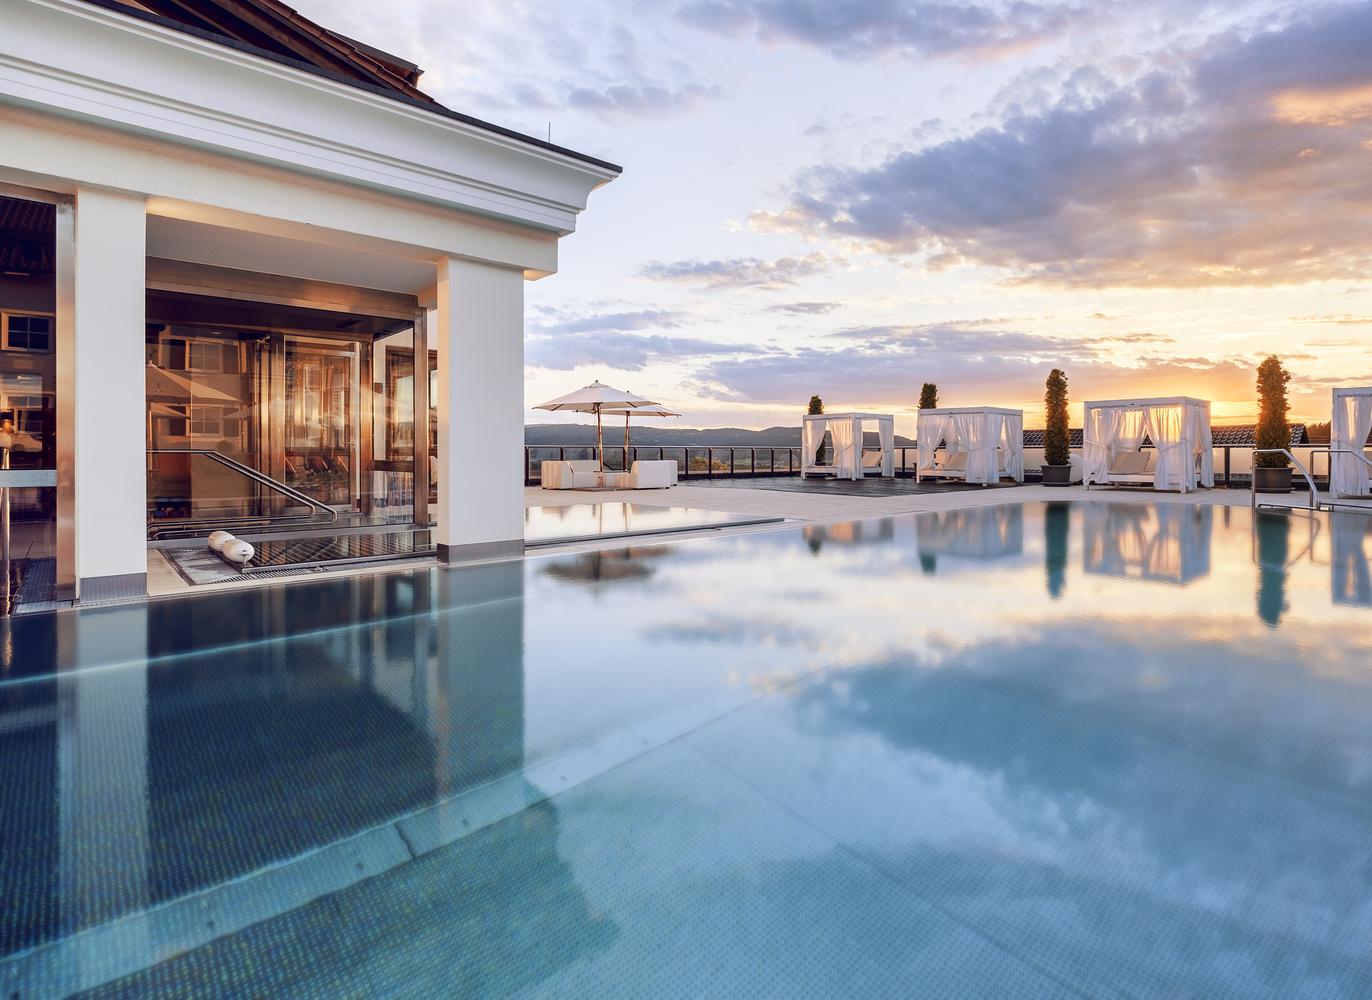 Panorama pool at Relais & Châteaux Landromantik Hotel Oswald by Matthias Dengler